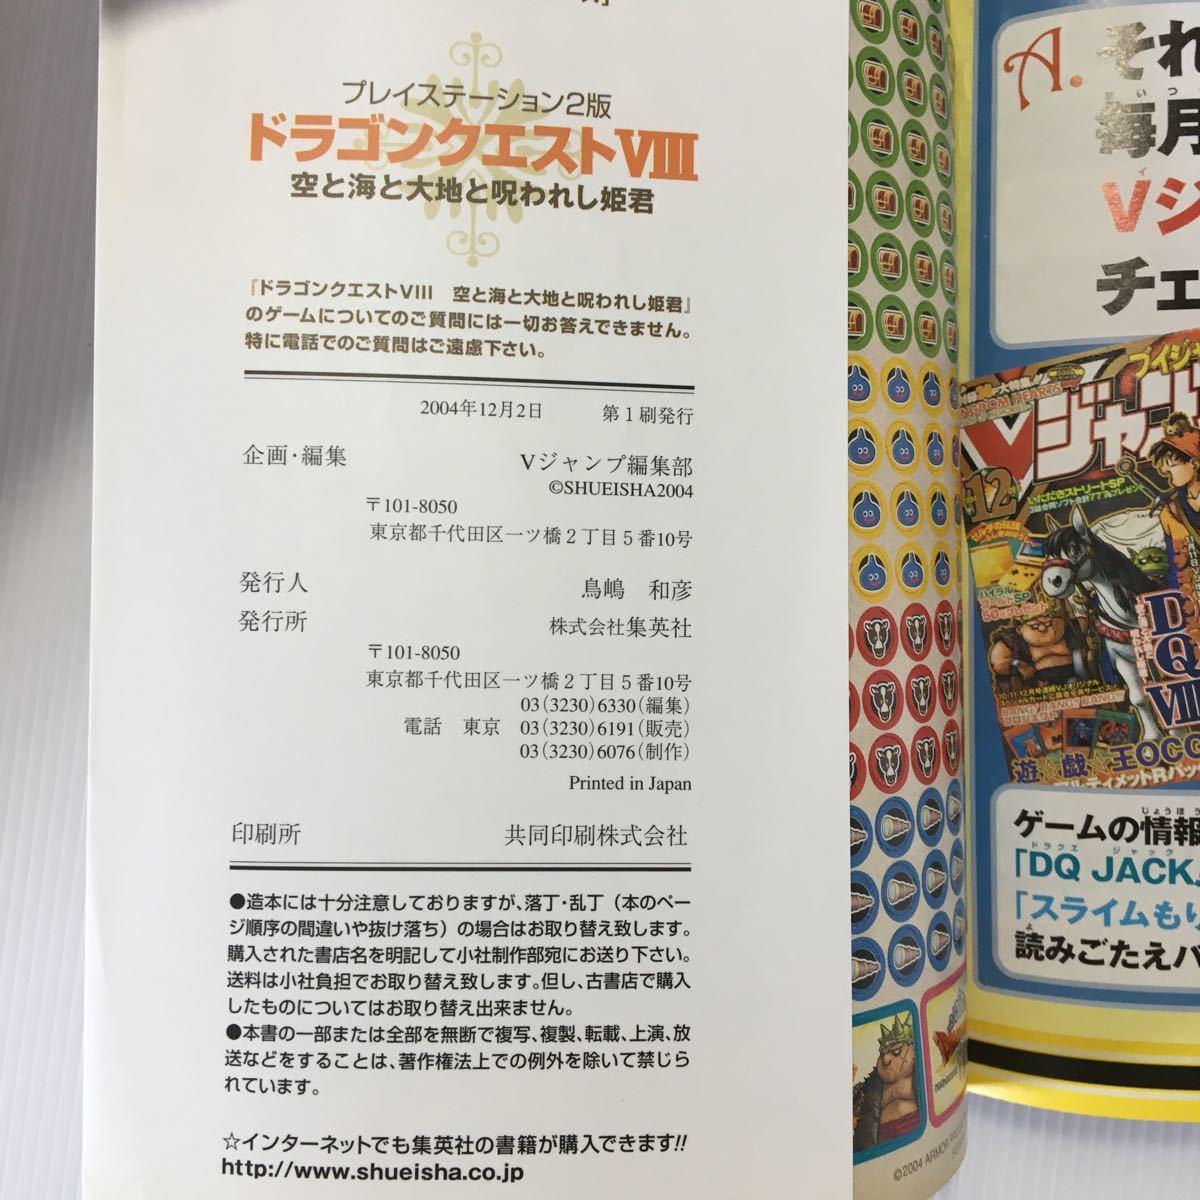 zaa-043★ドラゴンクエスト8 空と海と大地と呪われし姫君 (Vジャンプブックス―ゲームシリーズ)(ソフトカバー) 2004年 Vジャンプ (編)